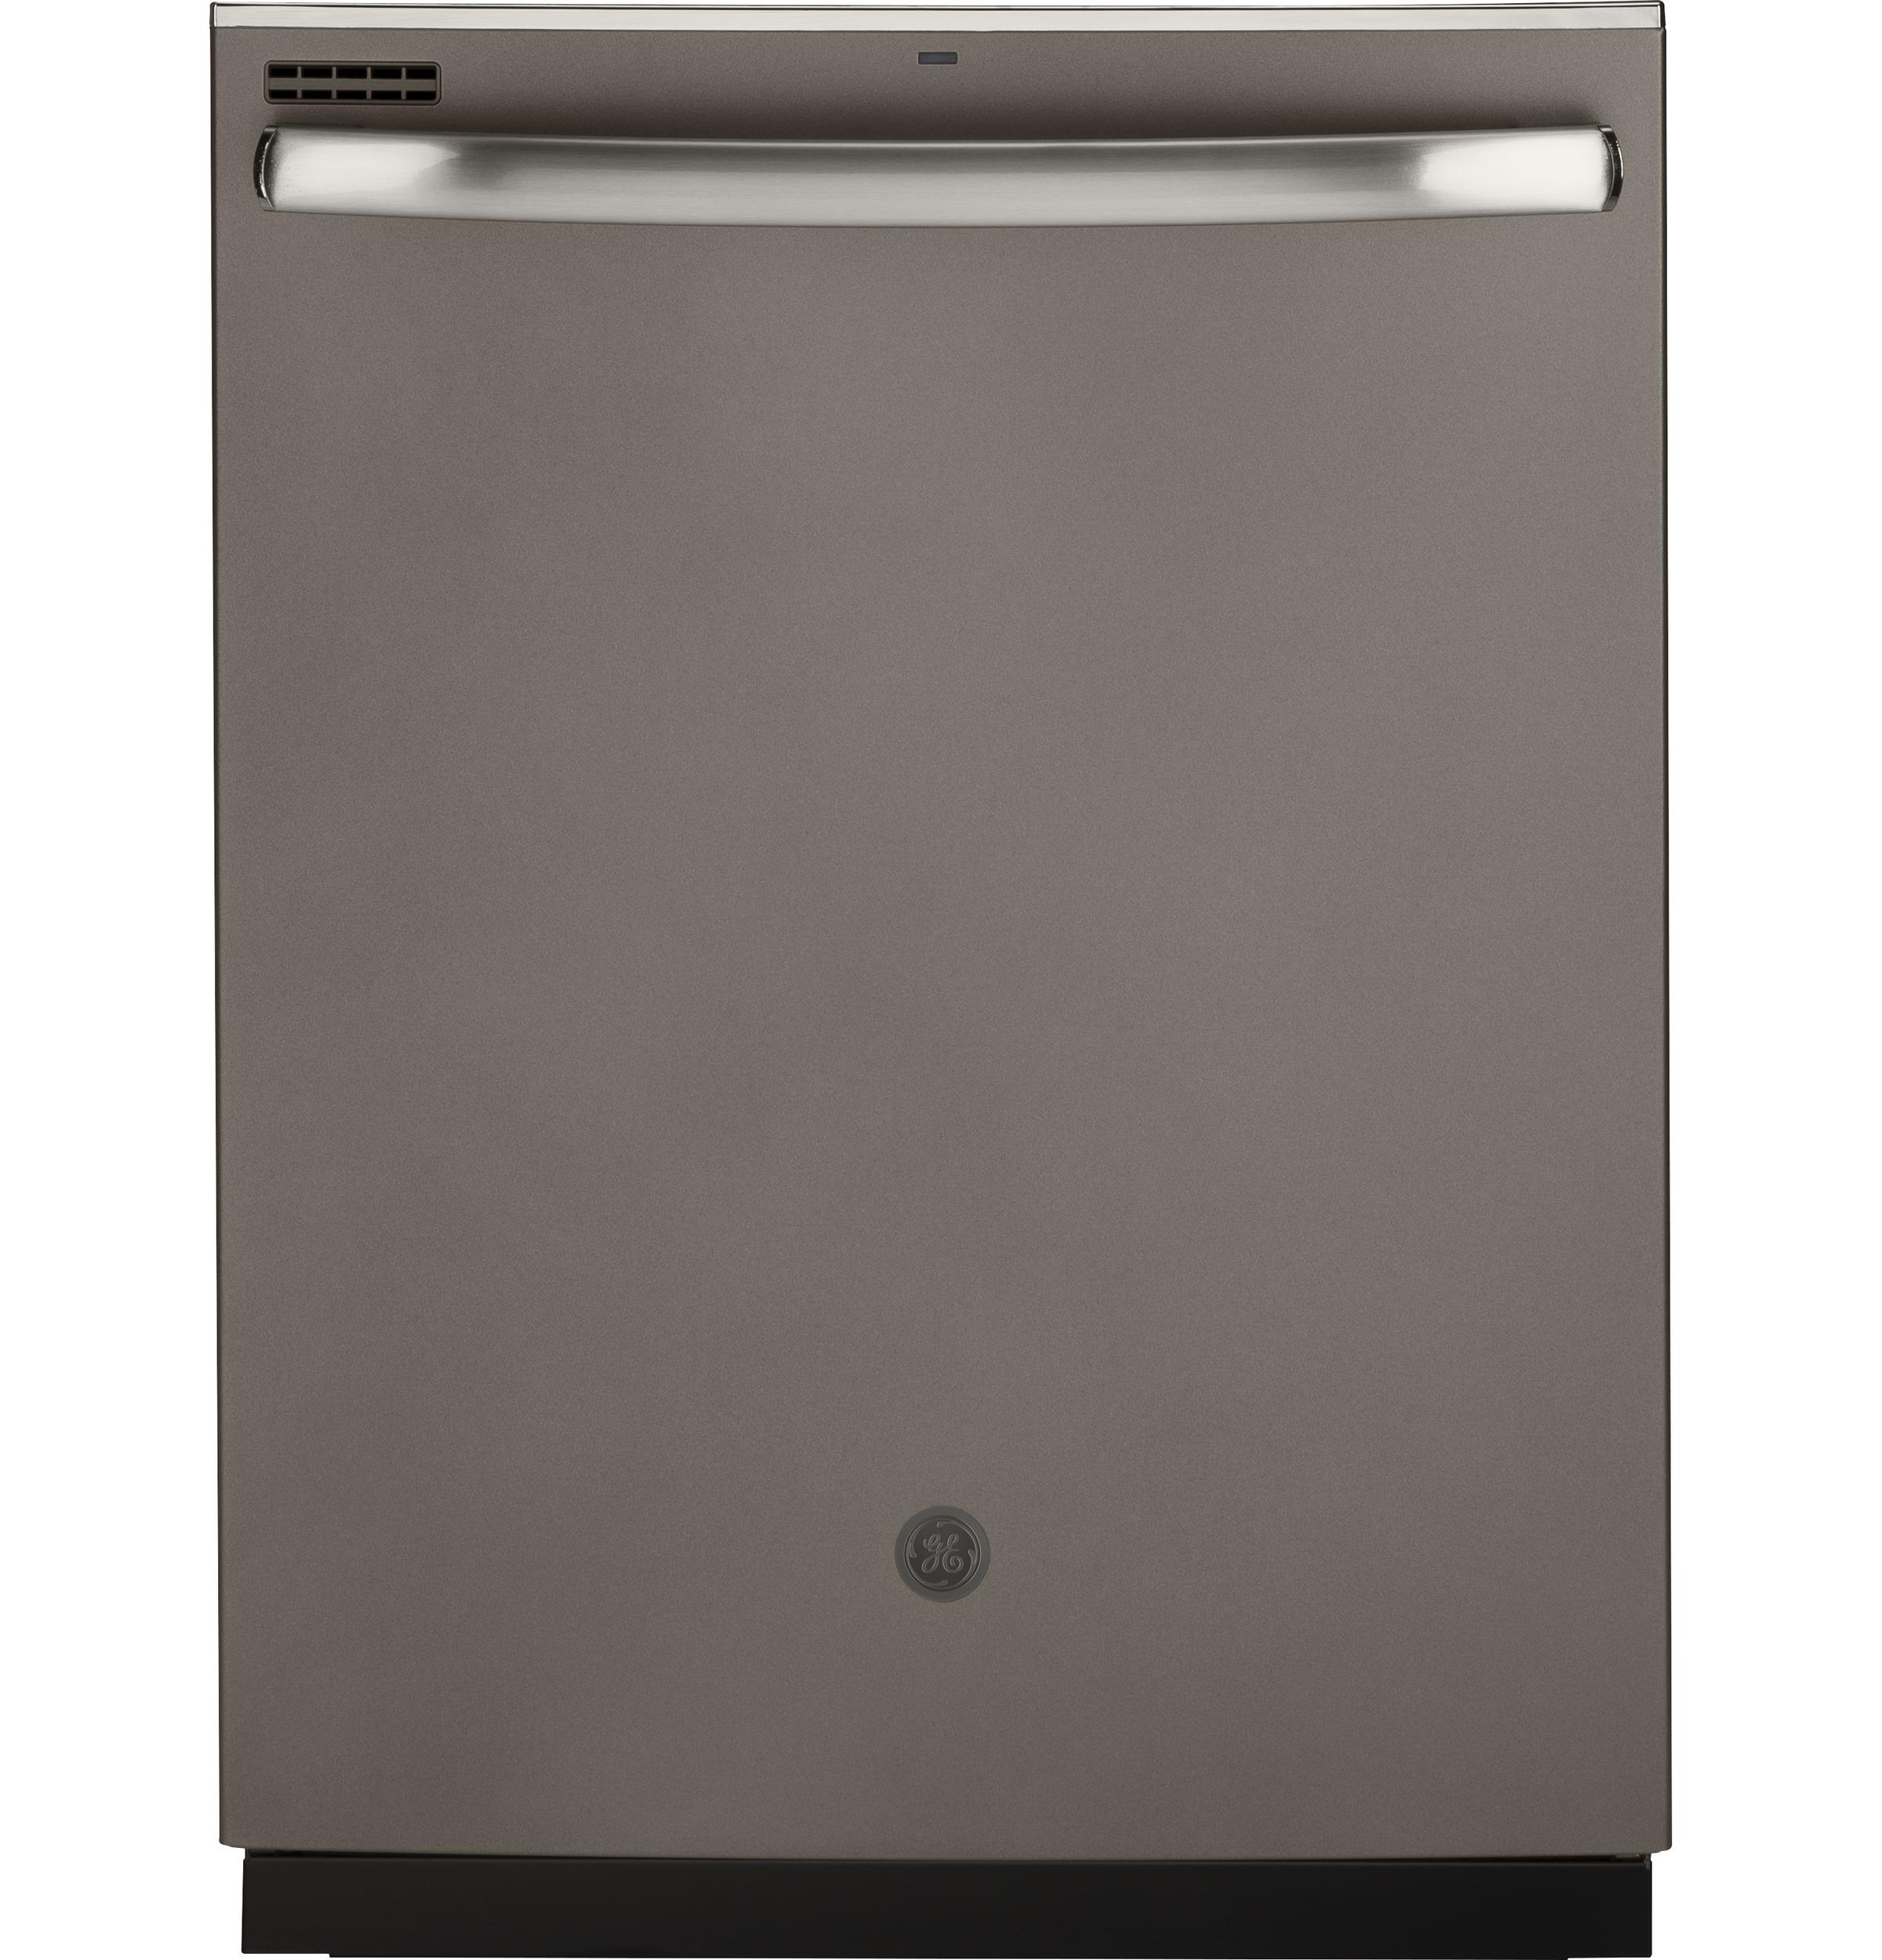 Model: GDT635HMMES | GE® Hybrid Stainless Steel Interior Dishwasher with Hidden Controls